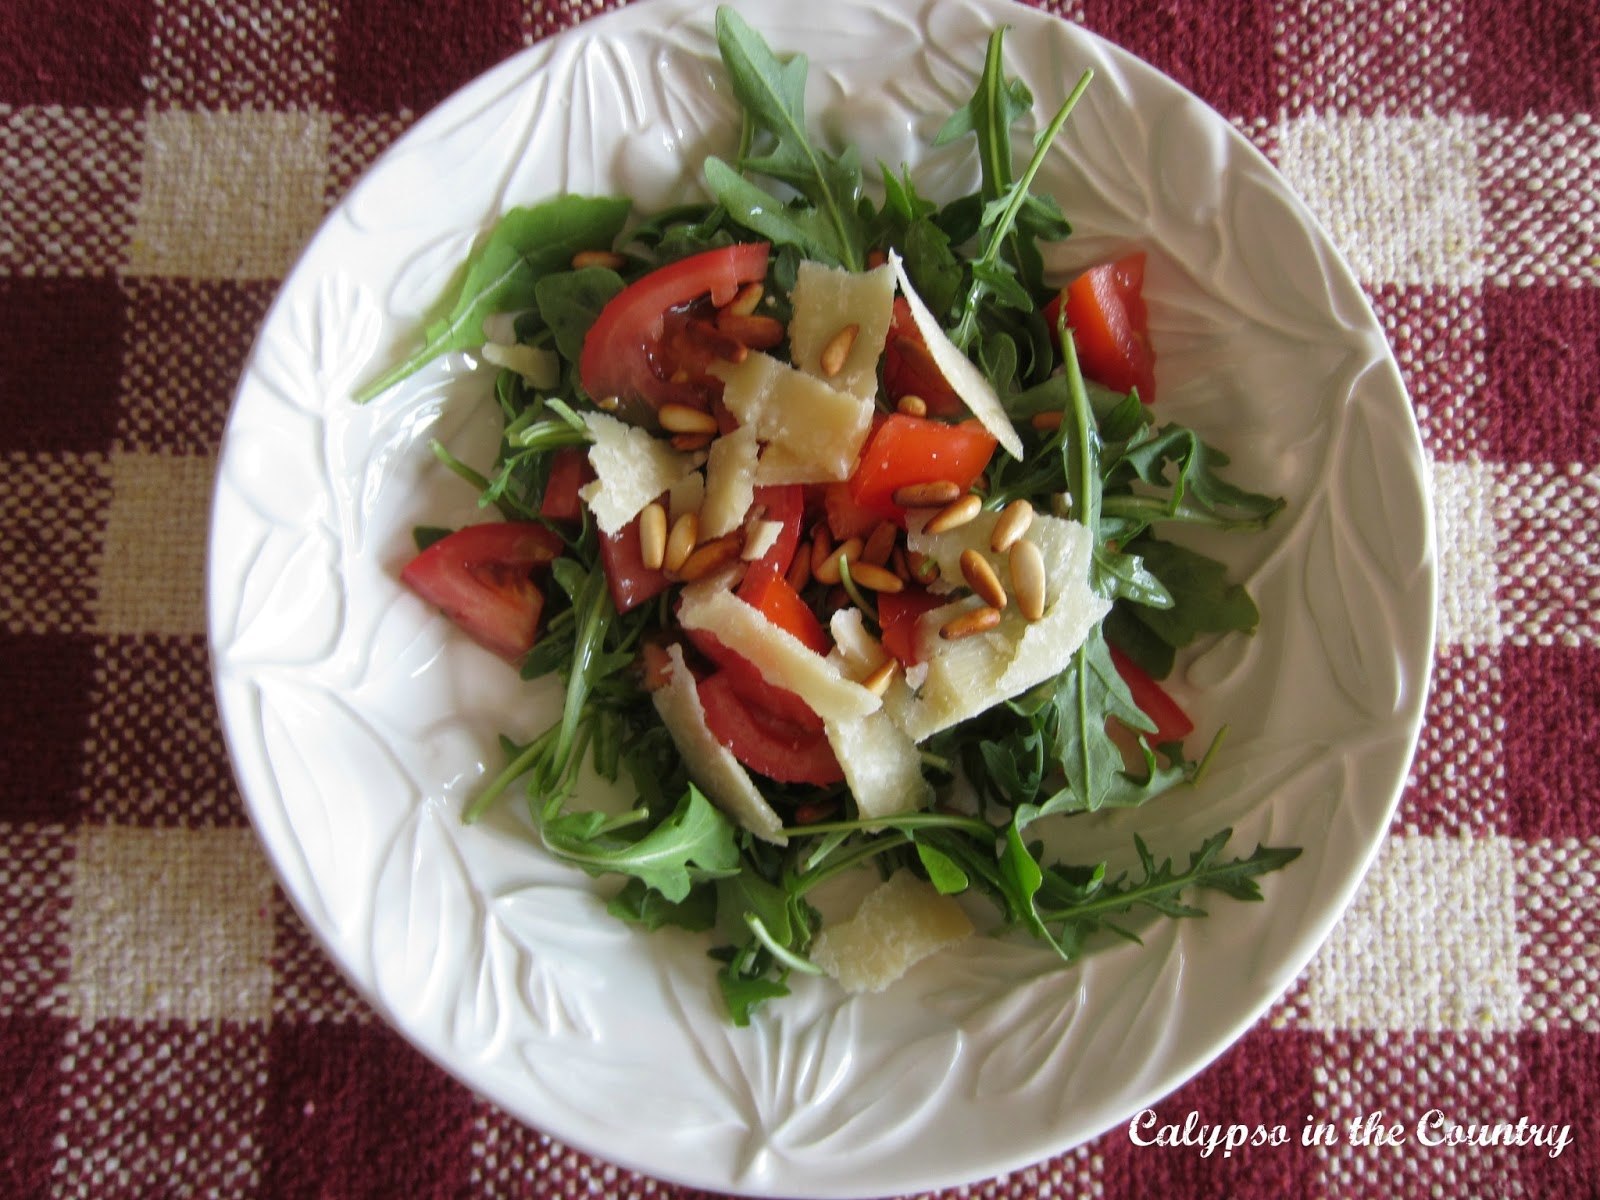 Arugula Salad with Parmesan